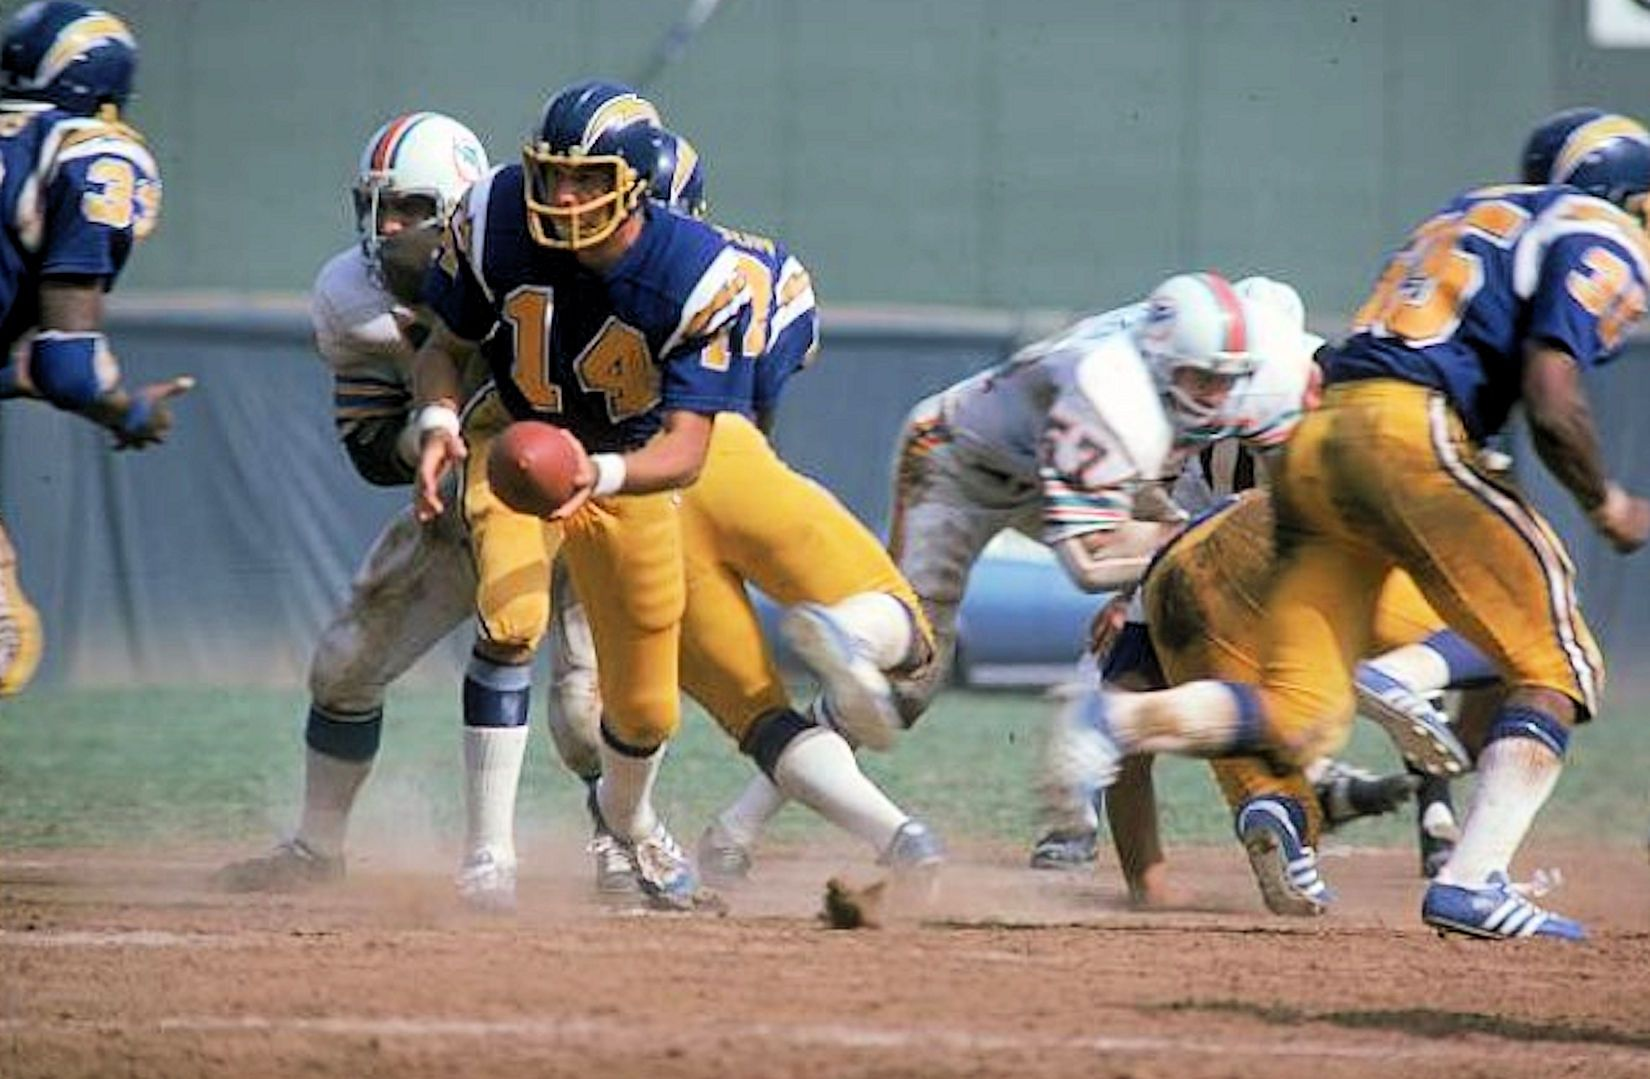 1974 Miami at San Diego Nfl football, Football helmets